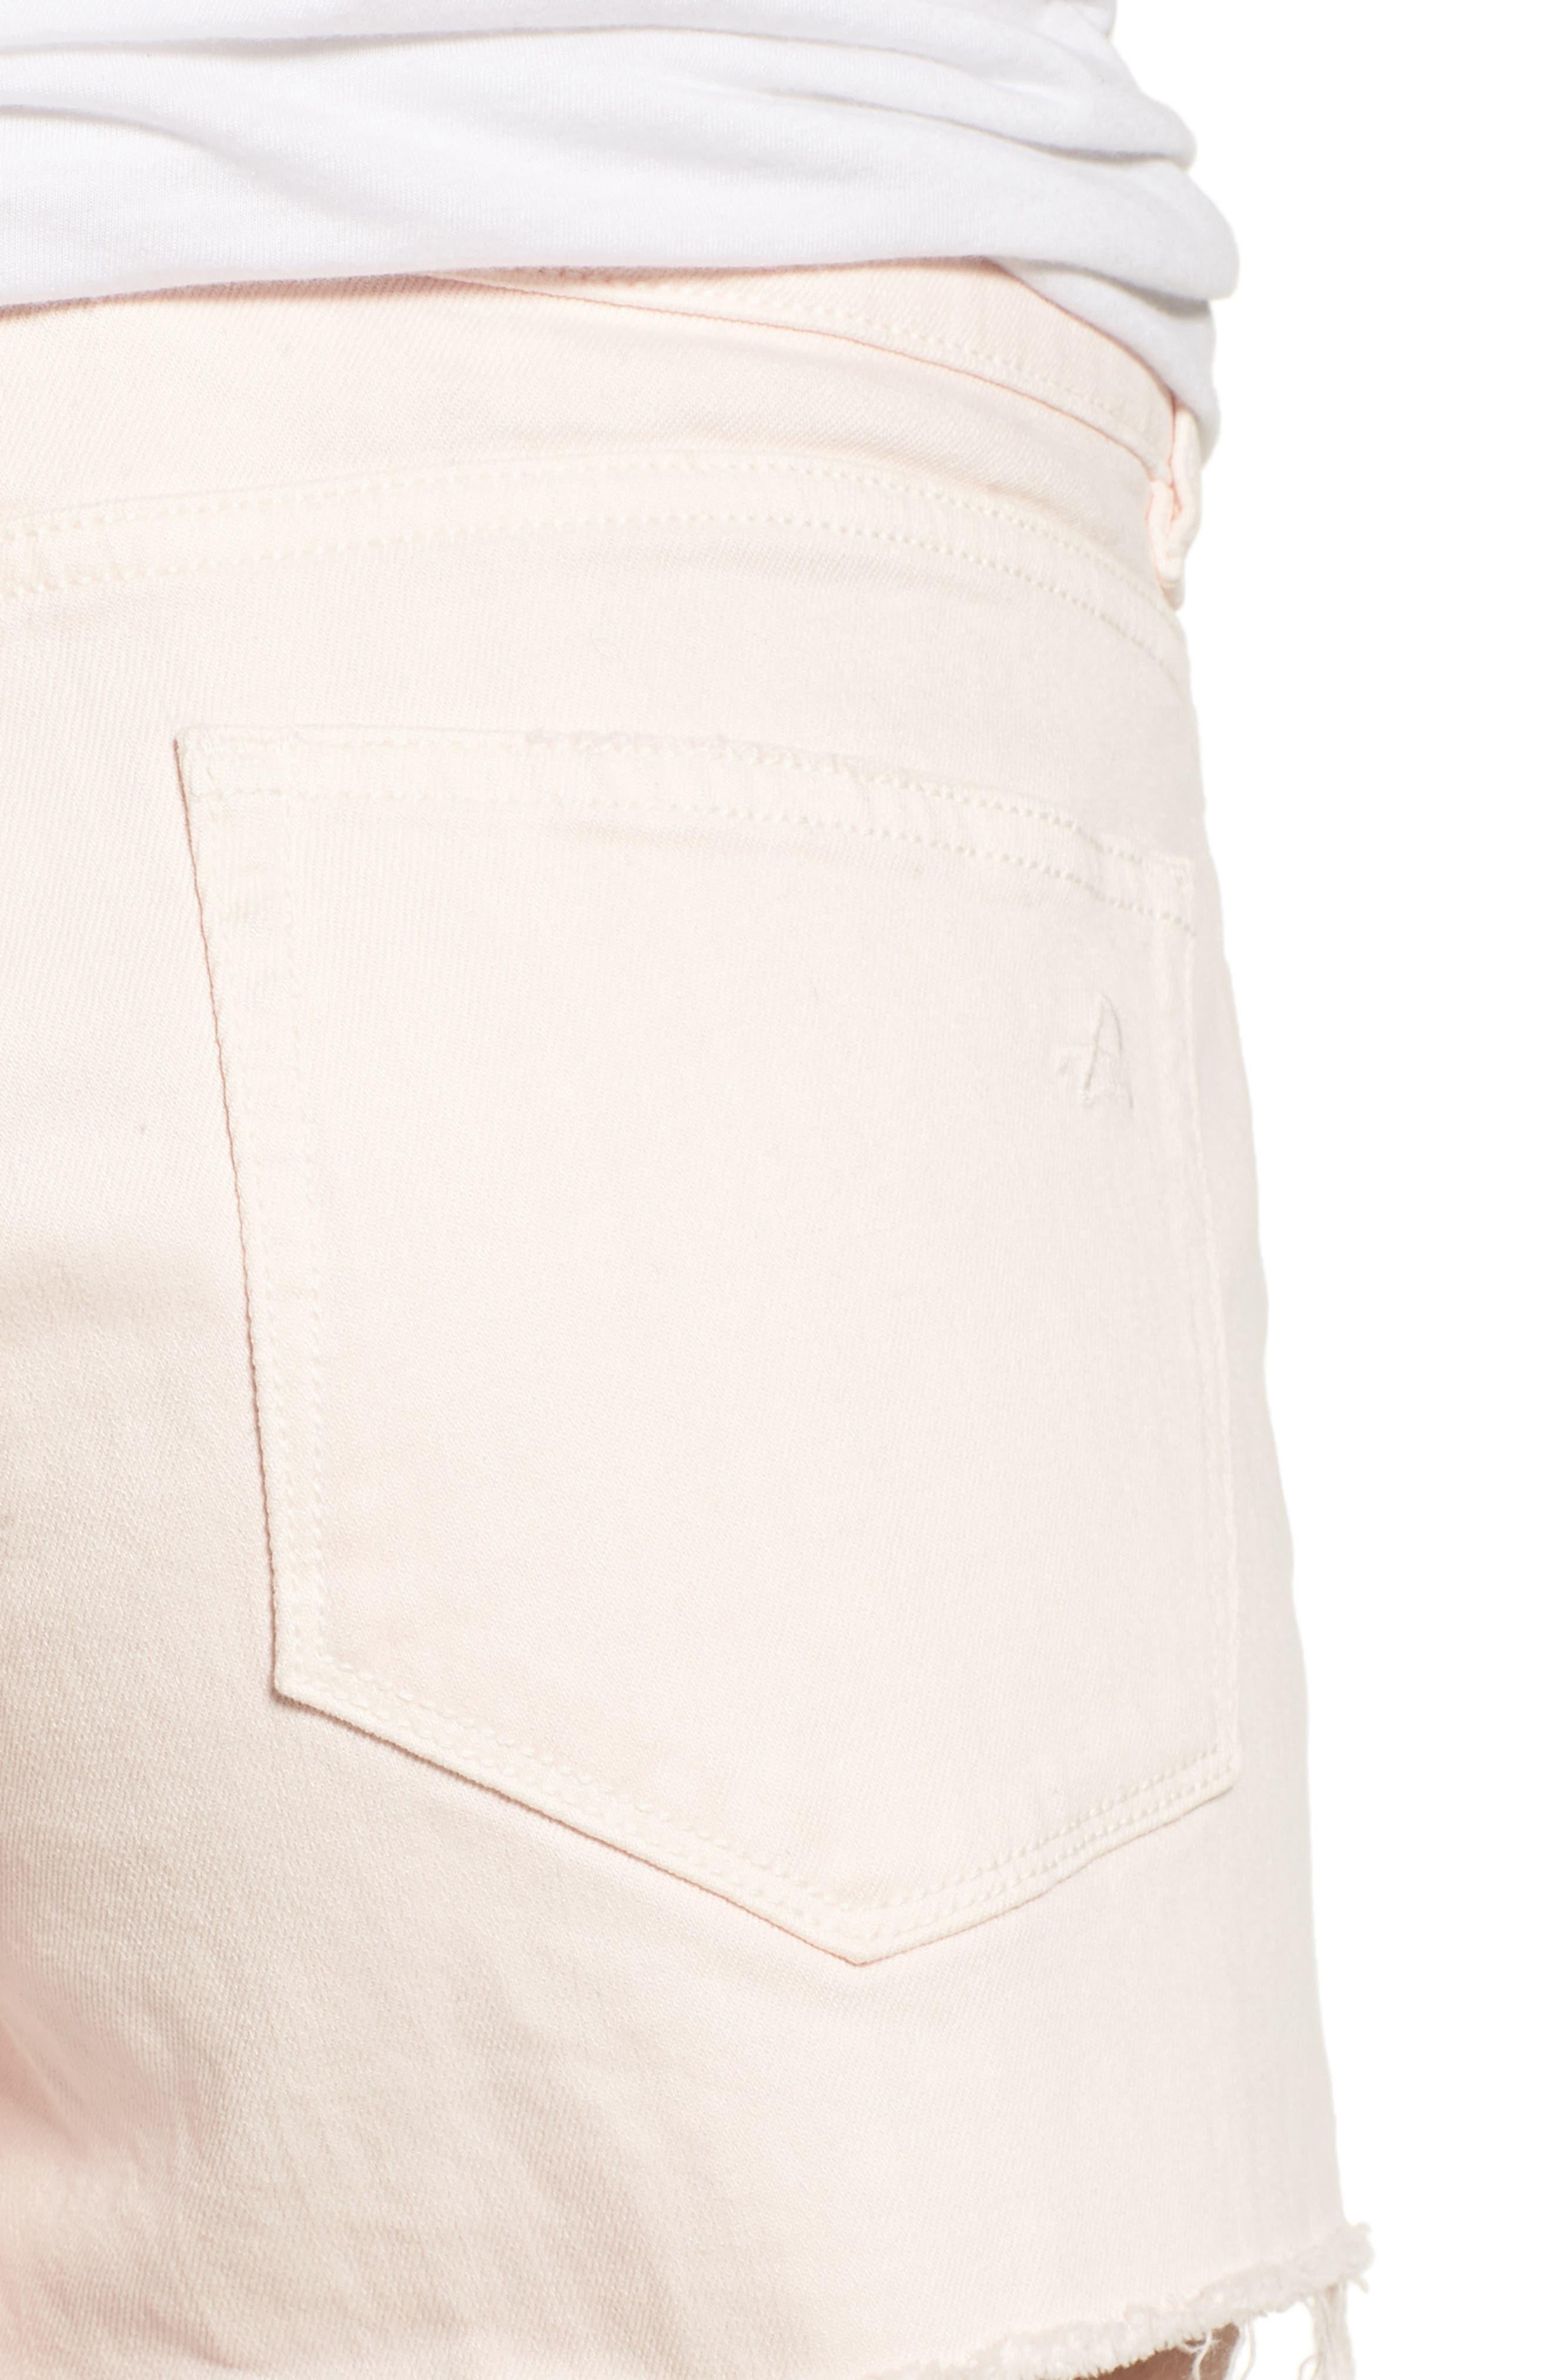 Renee Notch Raw Hem Denim Shorts,                             Alternate thumbnail 4, color,                             651